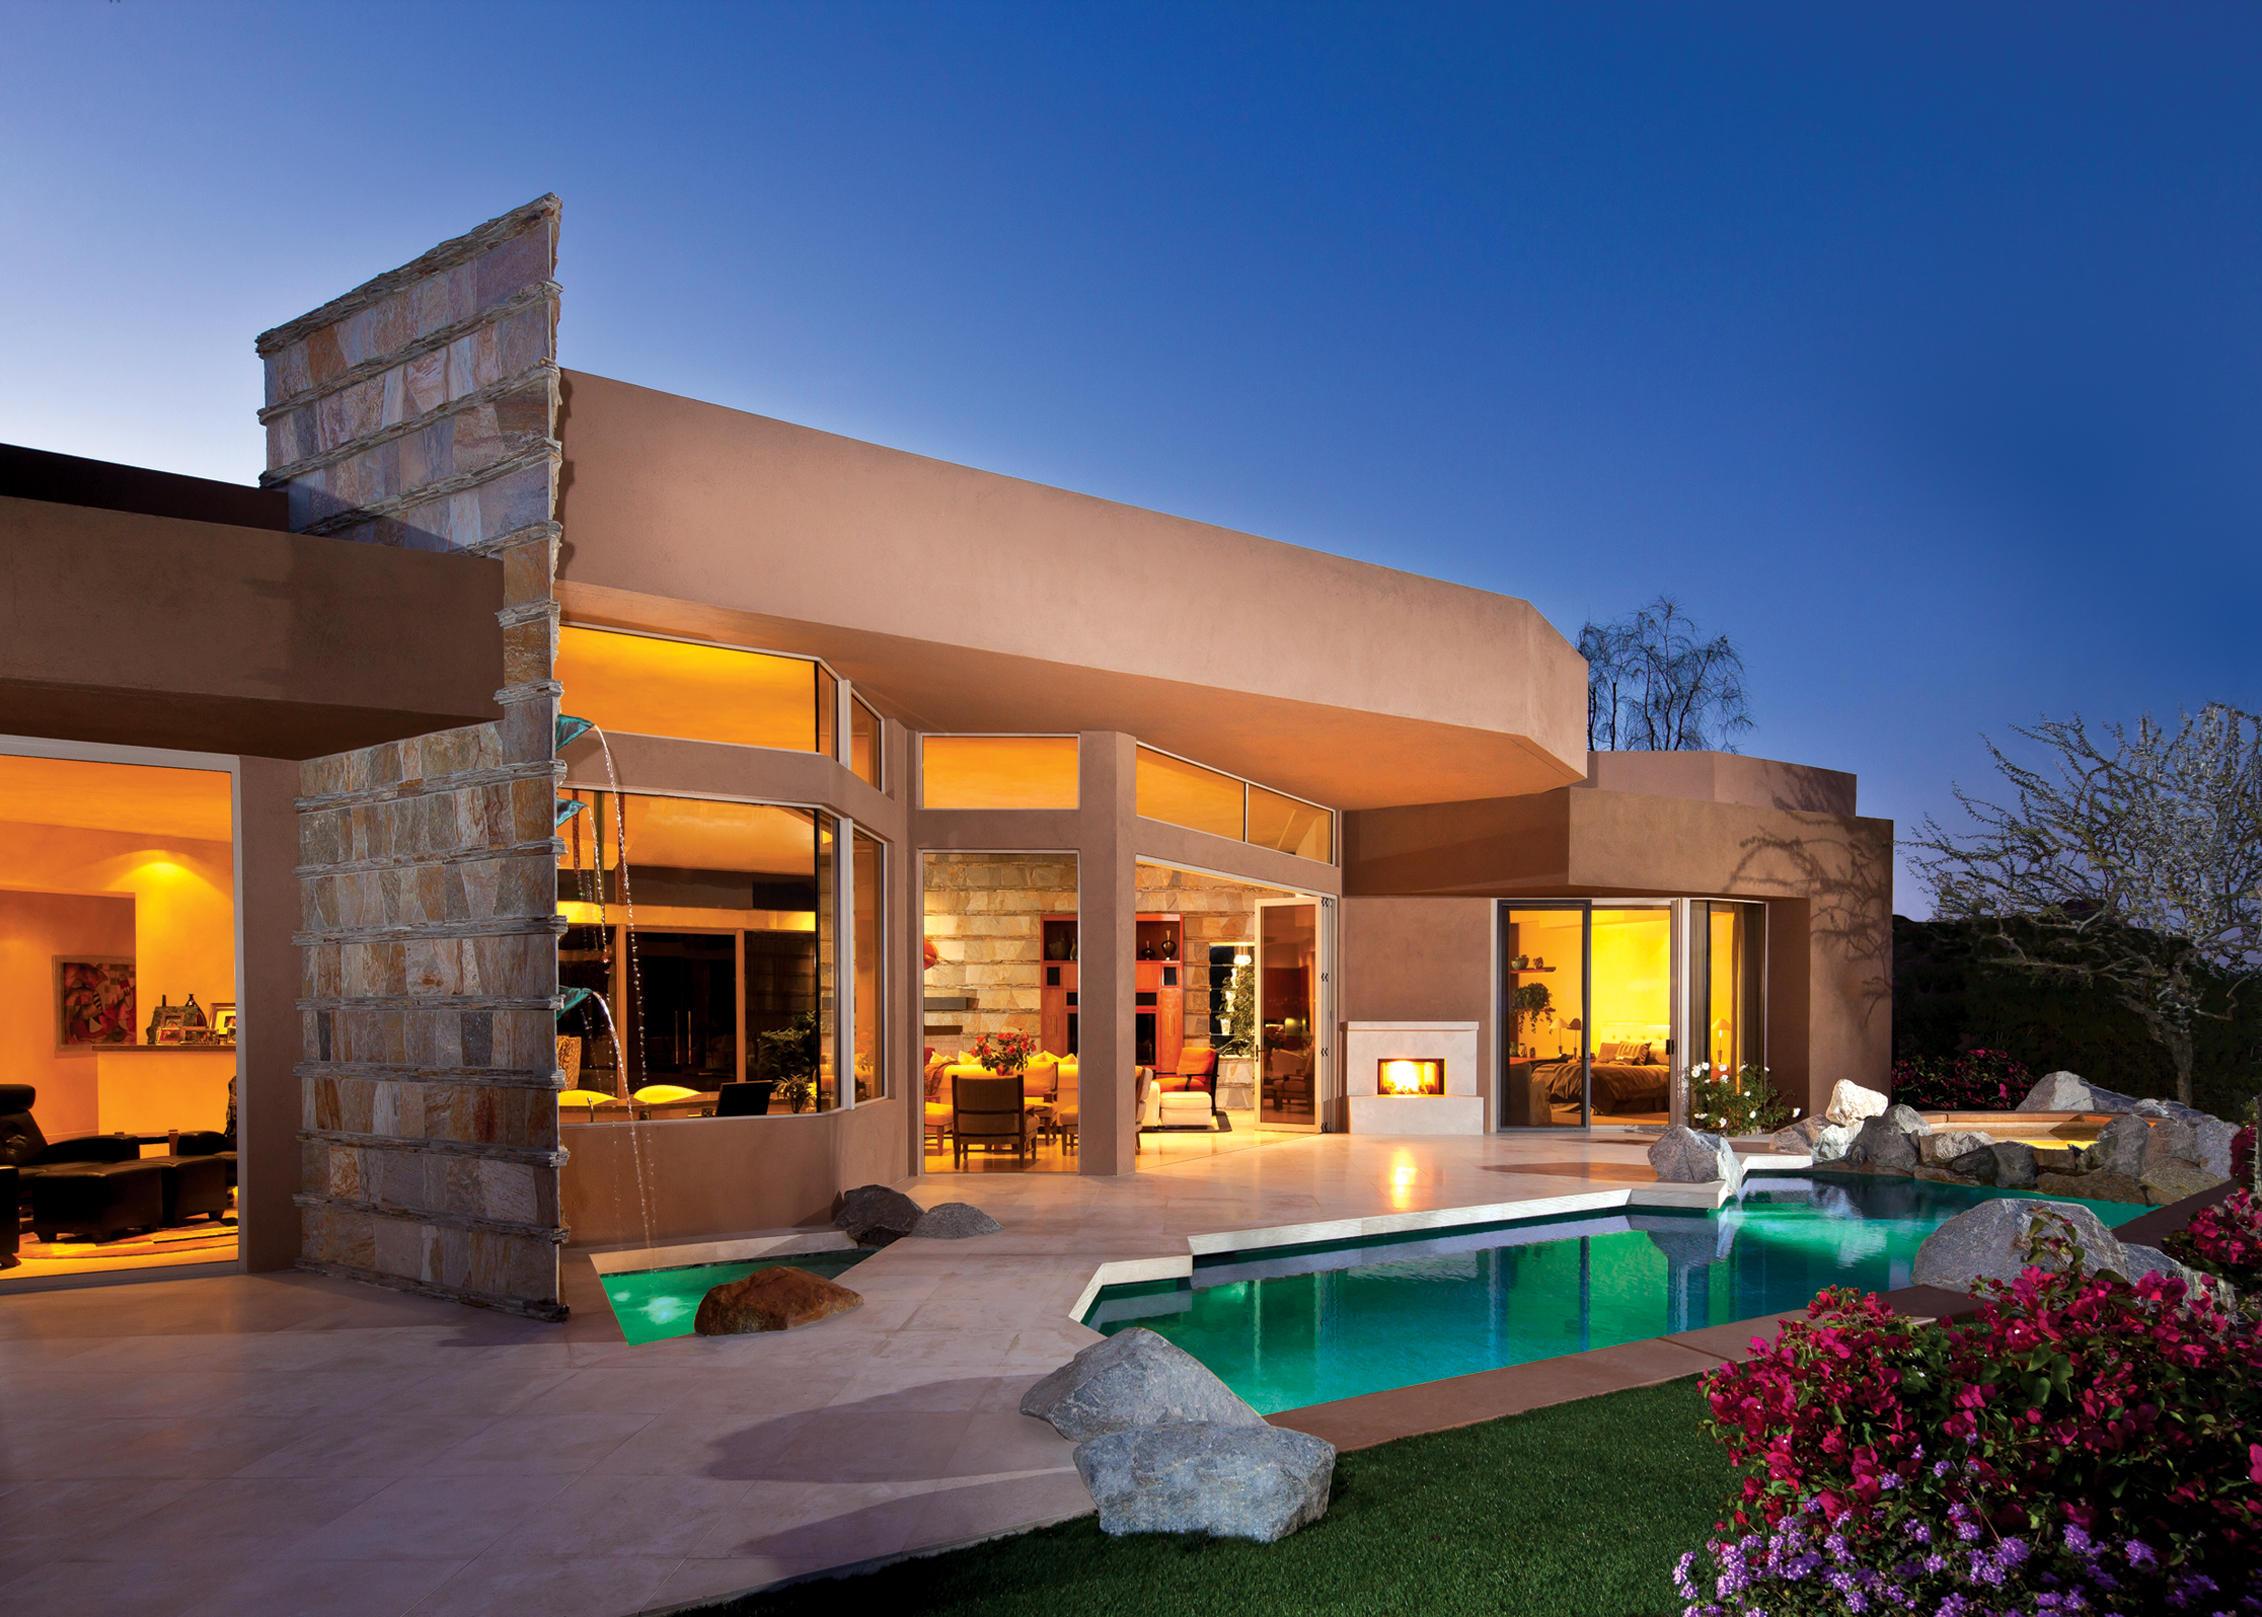 154 Kiva Drive, Palm Desert, CA 92260